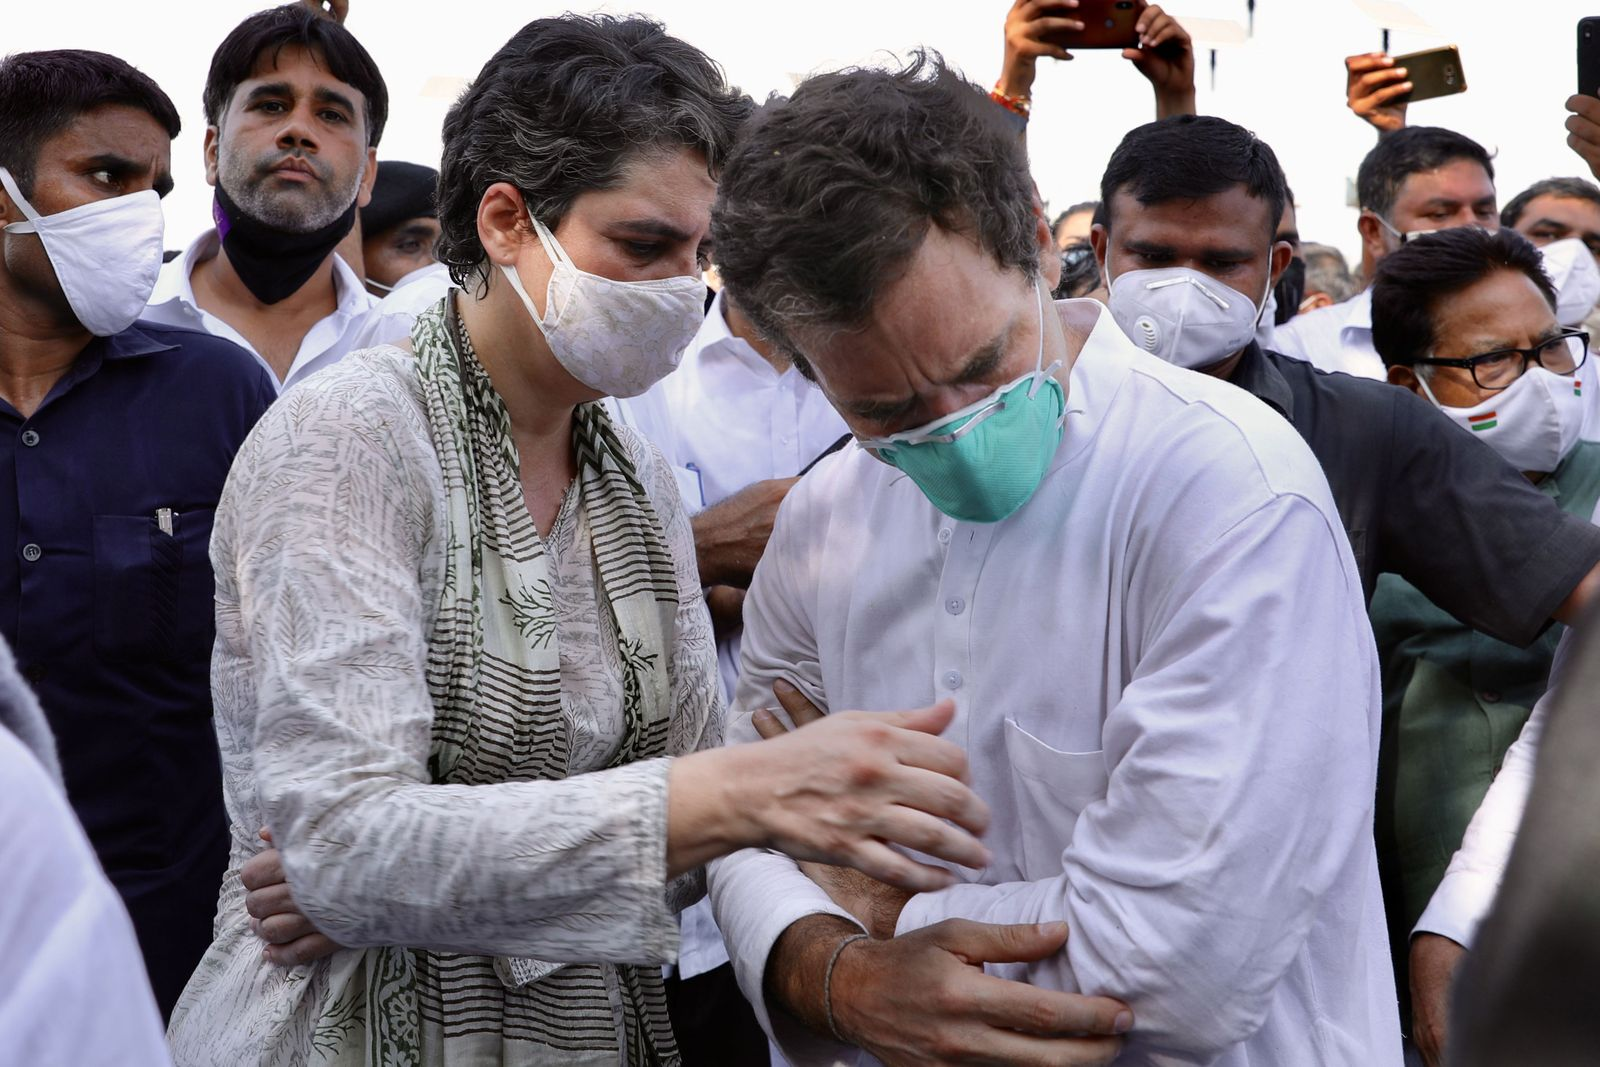 Former congress president Rahul Gandhi with sister Priyanka Gandhi Vadra detained in Greater Noida, India - 01 Oct 2020